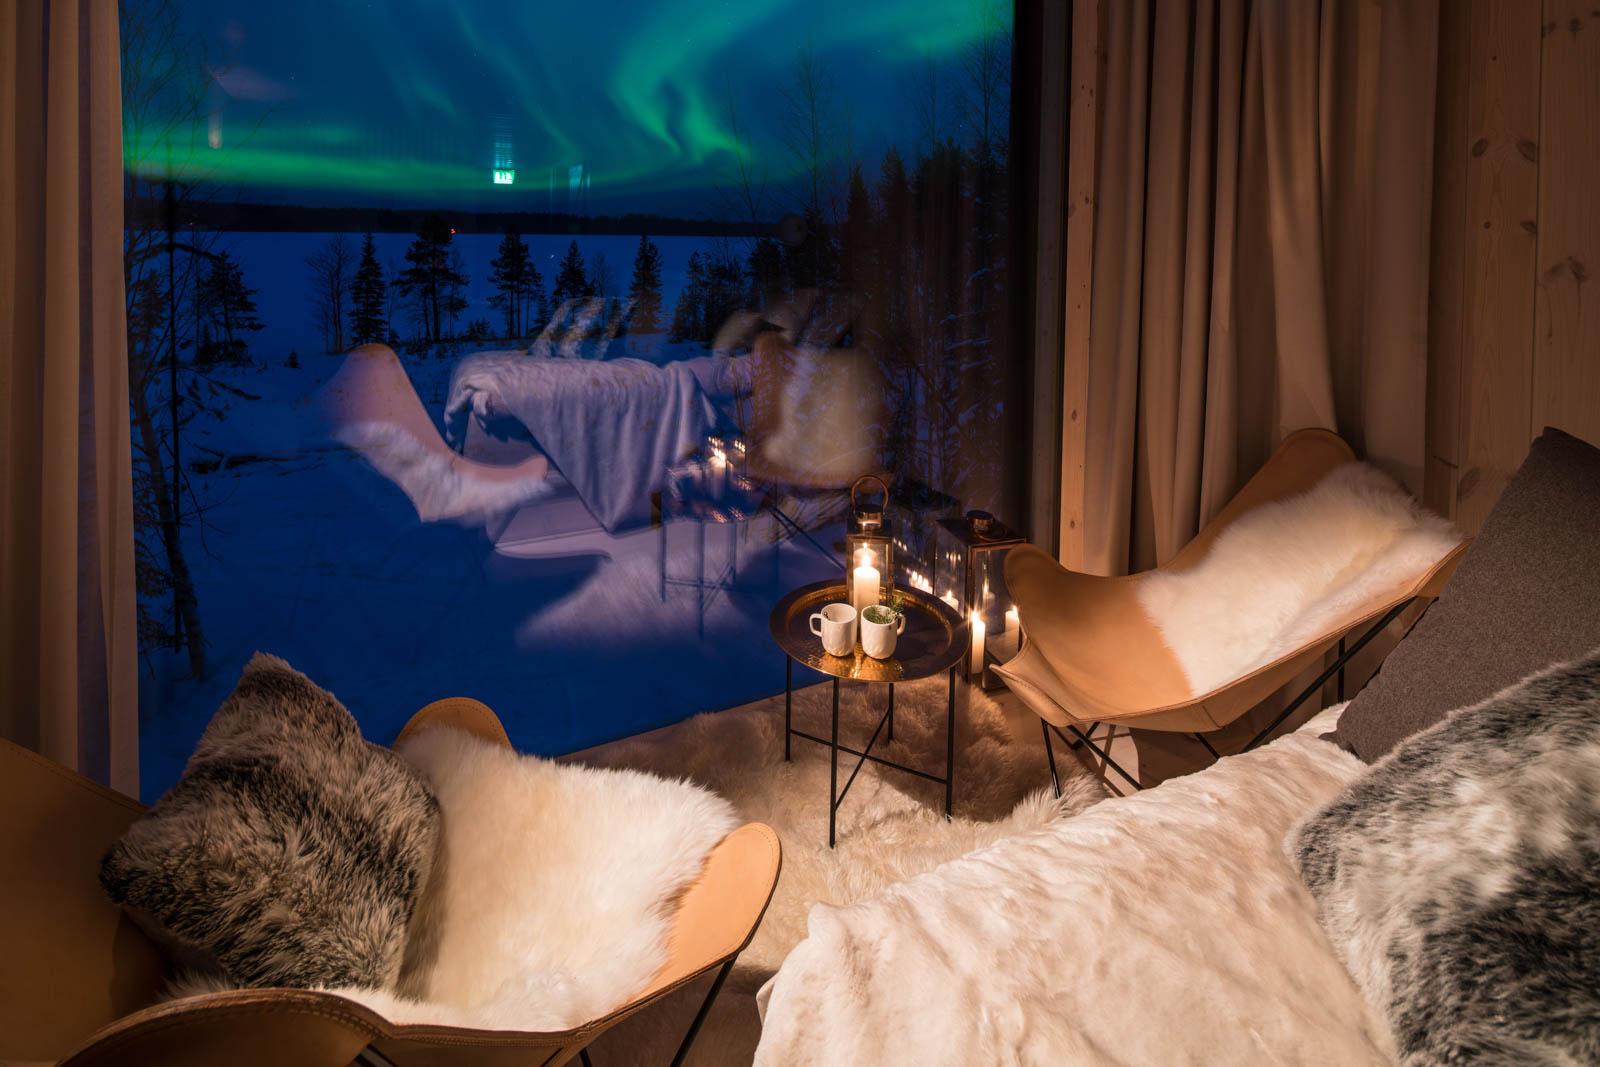 Arctic TreeHouse Hotel in Rovaniemi Lapland Finland